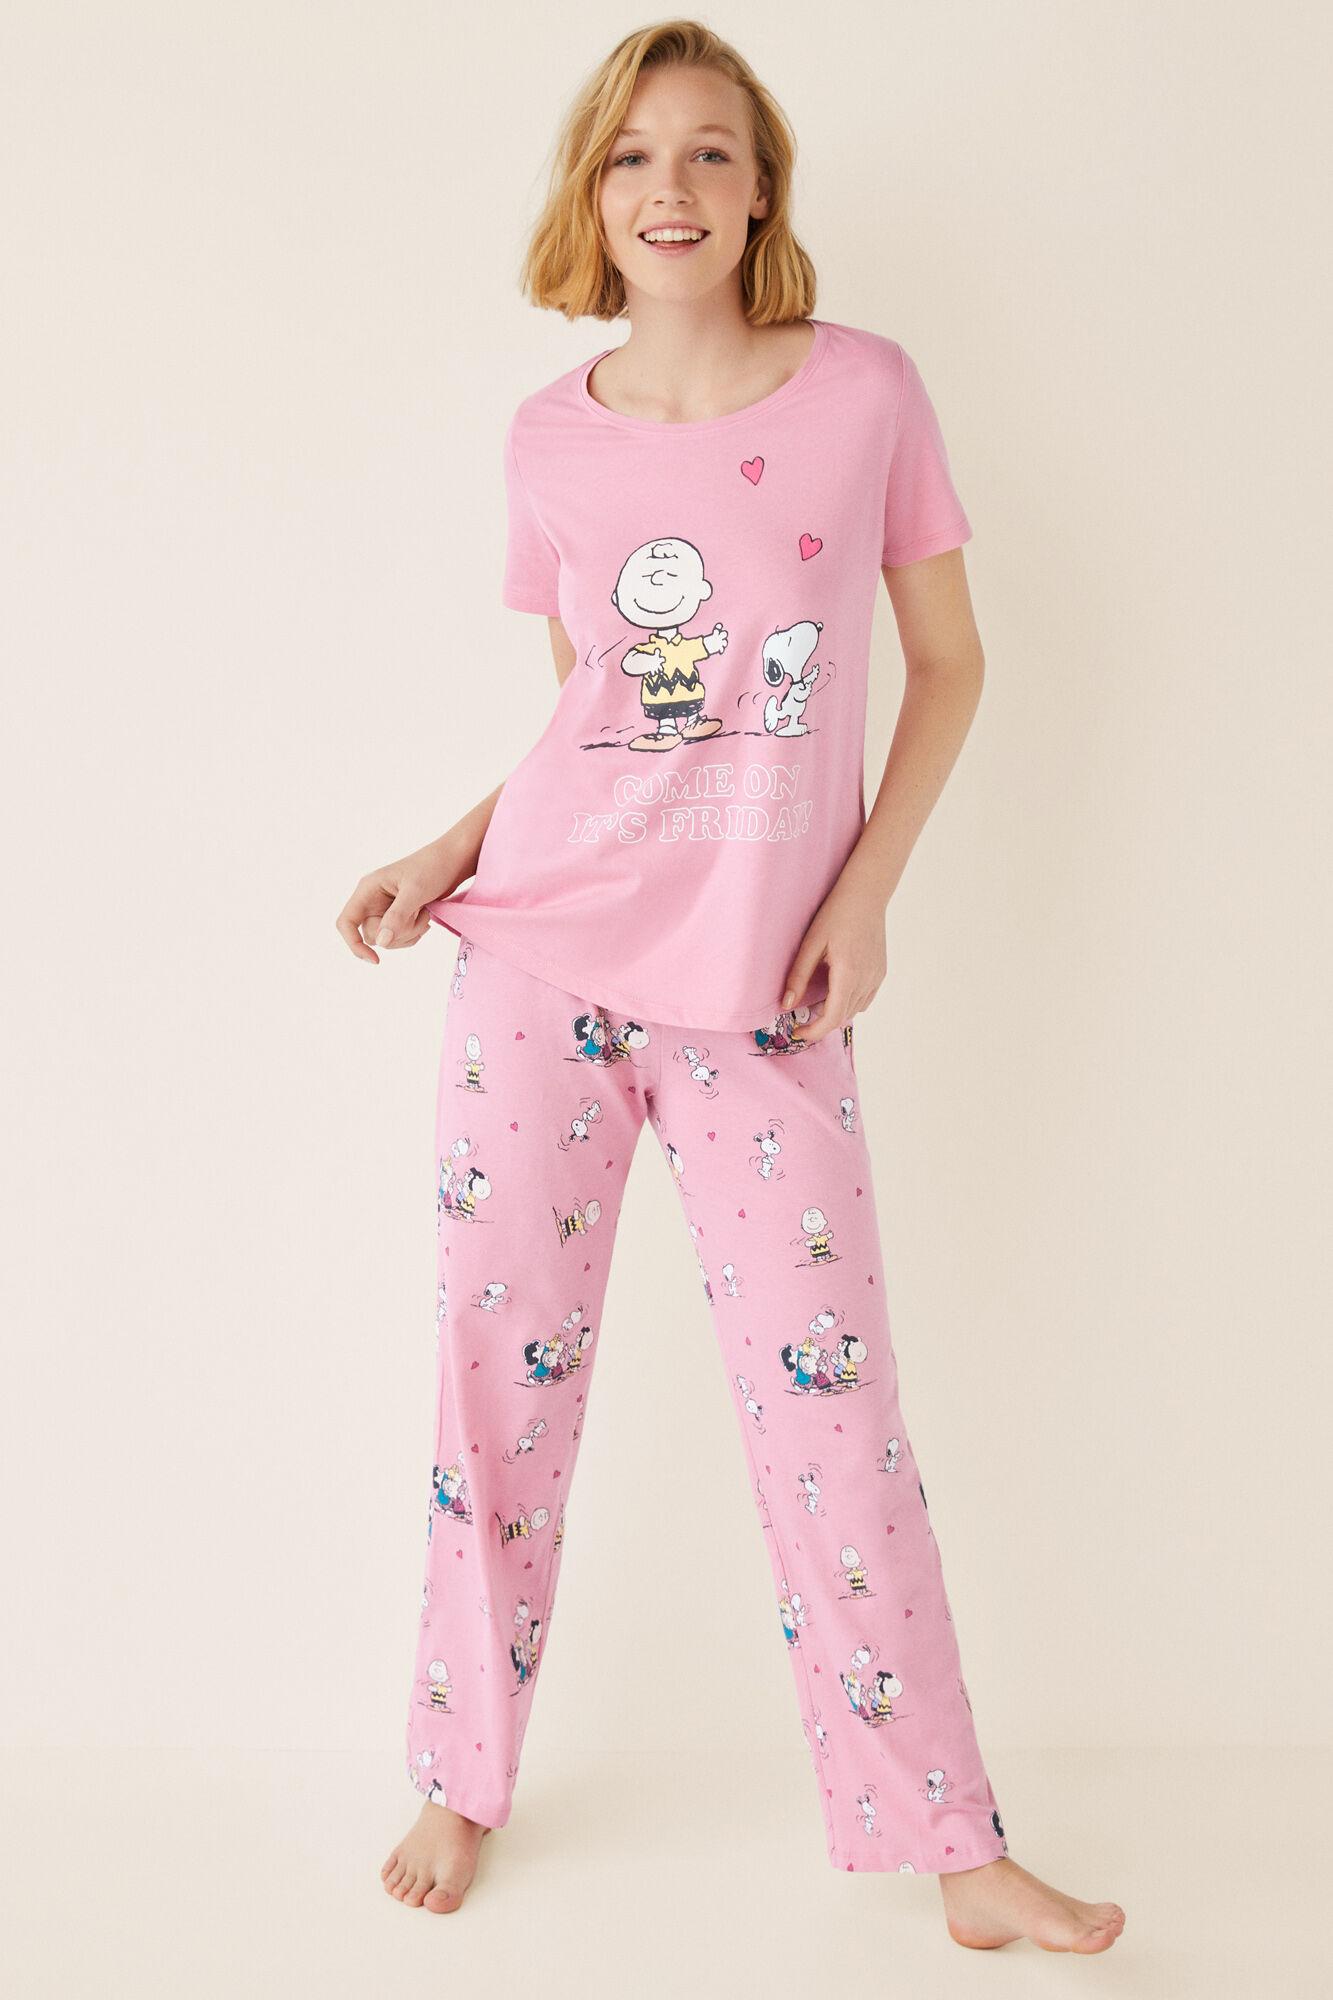 Friday Pijama Corta Corta Snoopy Pijama Manga Manga Snoopy UzVpLqSMG